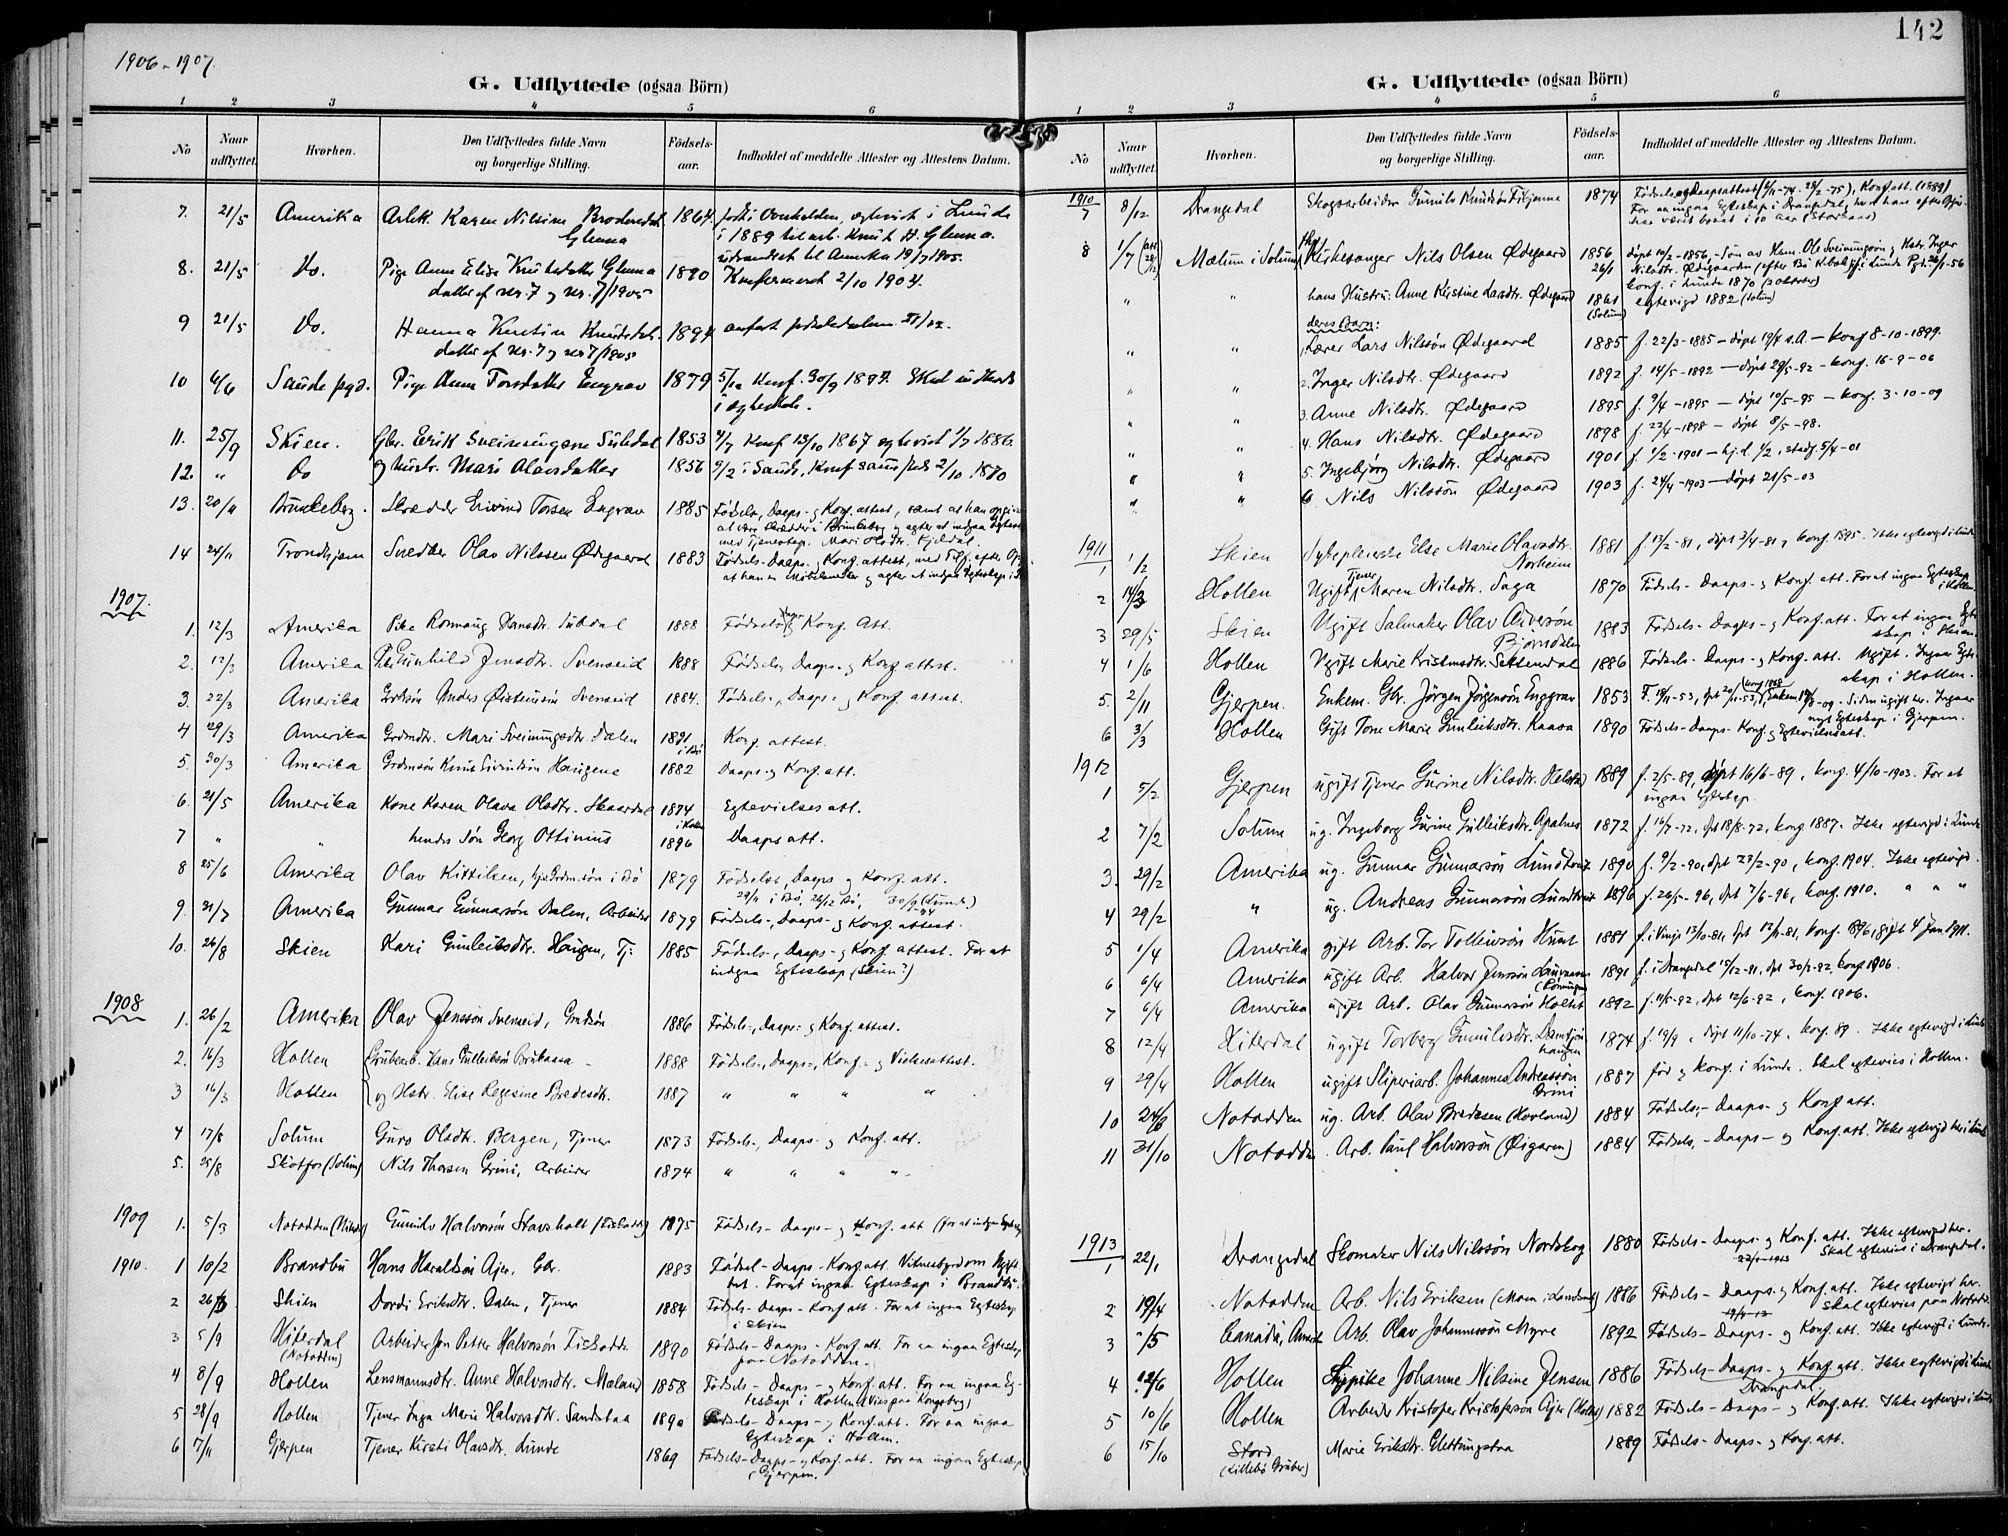 SAKO, Lunde kirkebøker, F/Fa/L0004: Ministerialbok nr. I 4, 1902-1913, s. 142